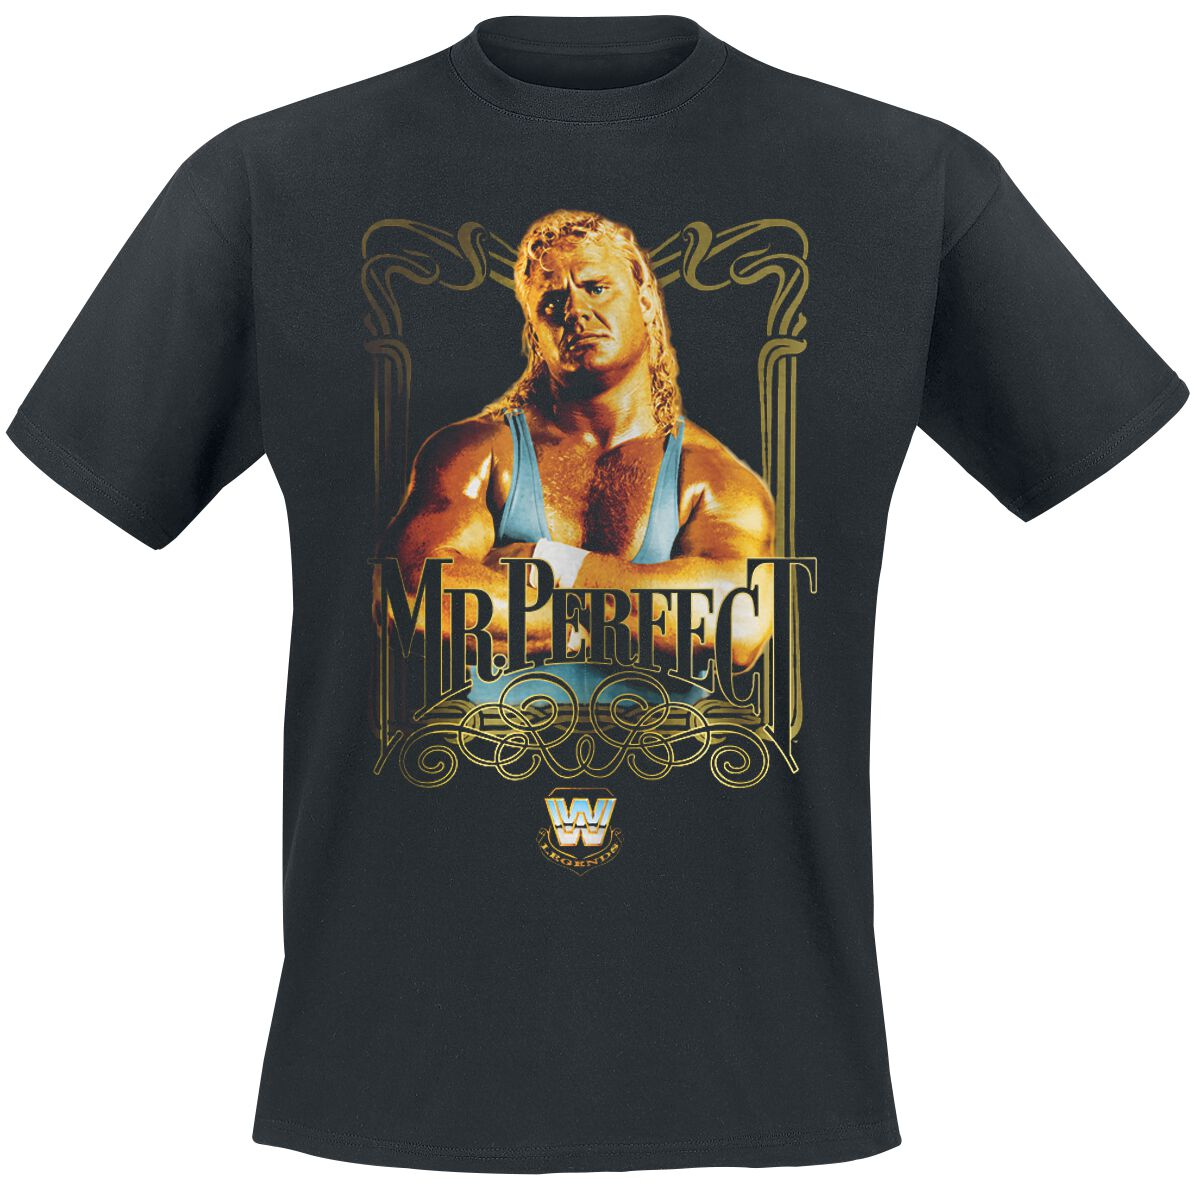 Merch dla Fanów - Koszulki - T-Shirt WWE Curt Hennig - Mr. Perfect T-Shirt czarny - 376806